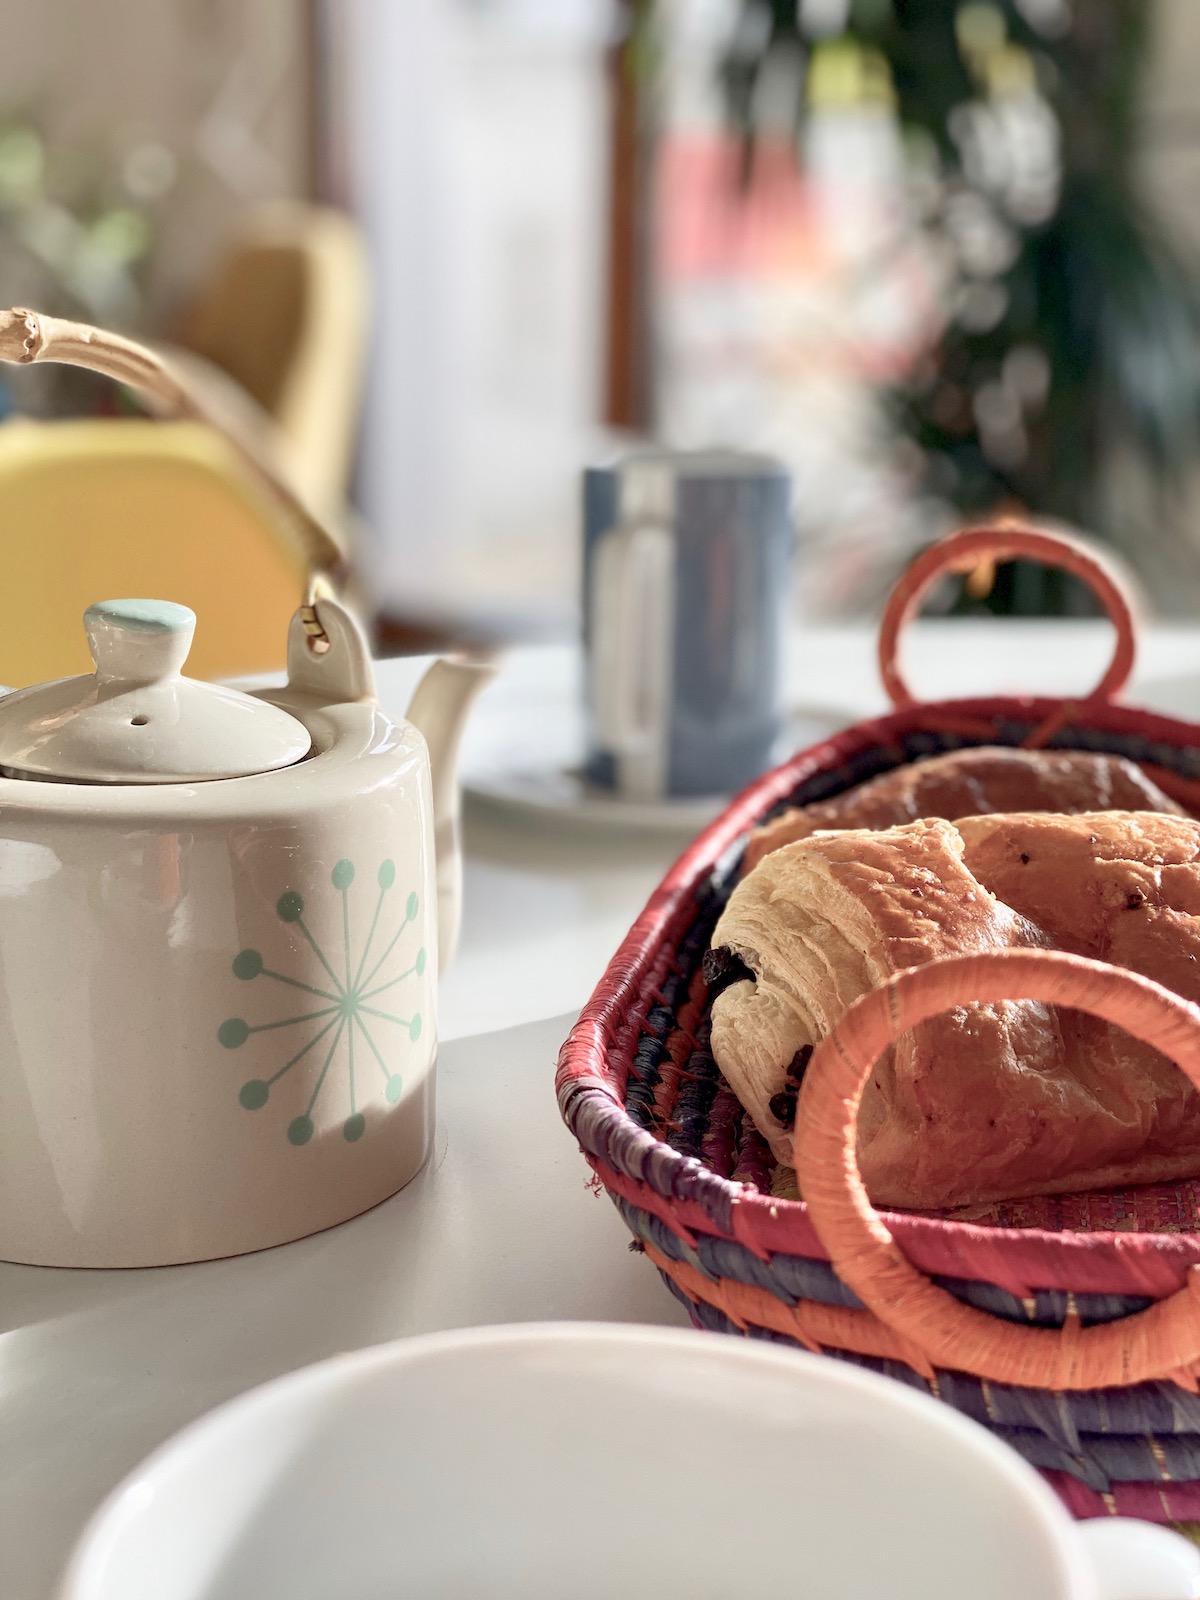 petit-déjeuner théière scandinave anse bambou panière pain tressé Sénégal